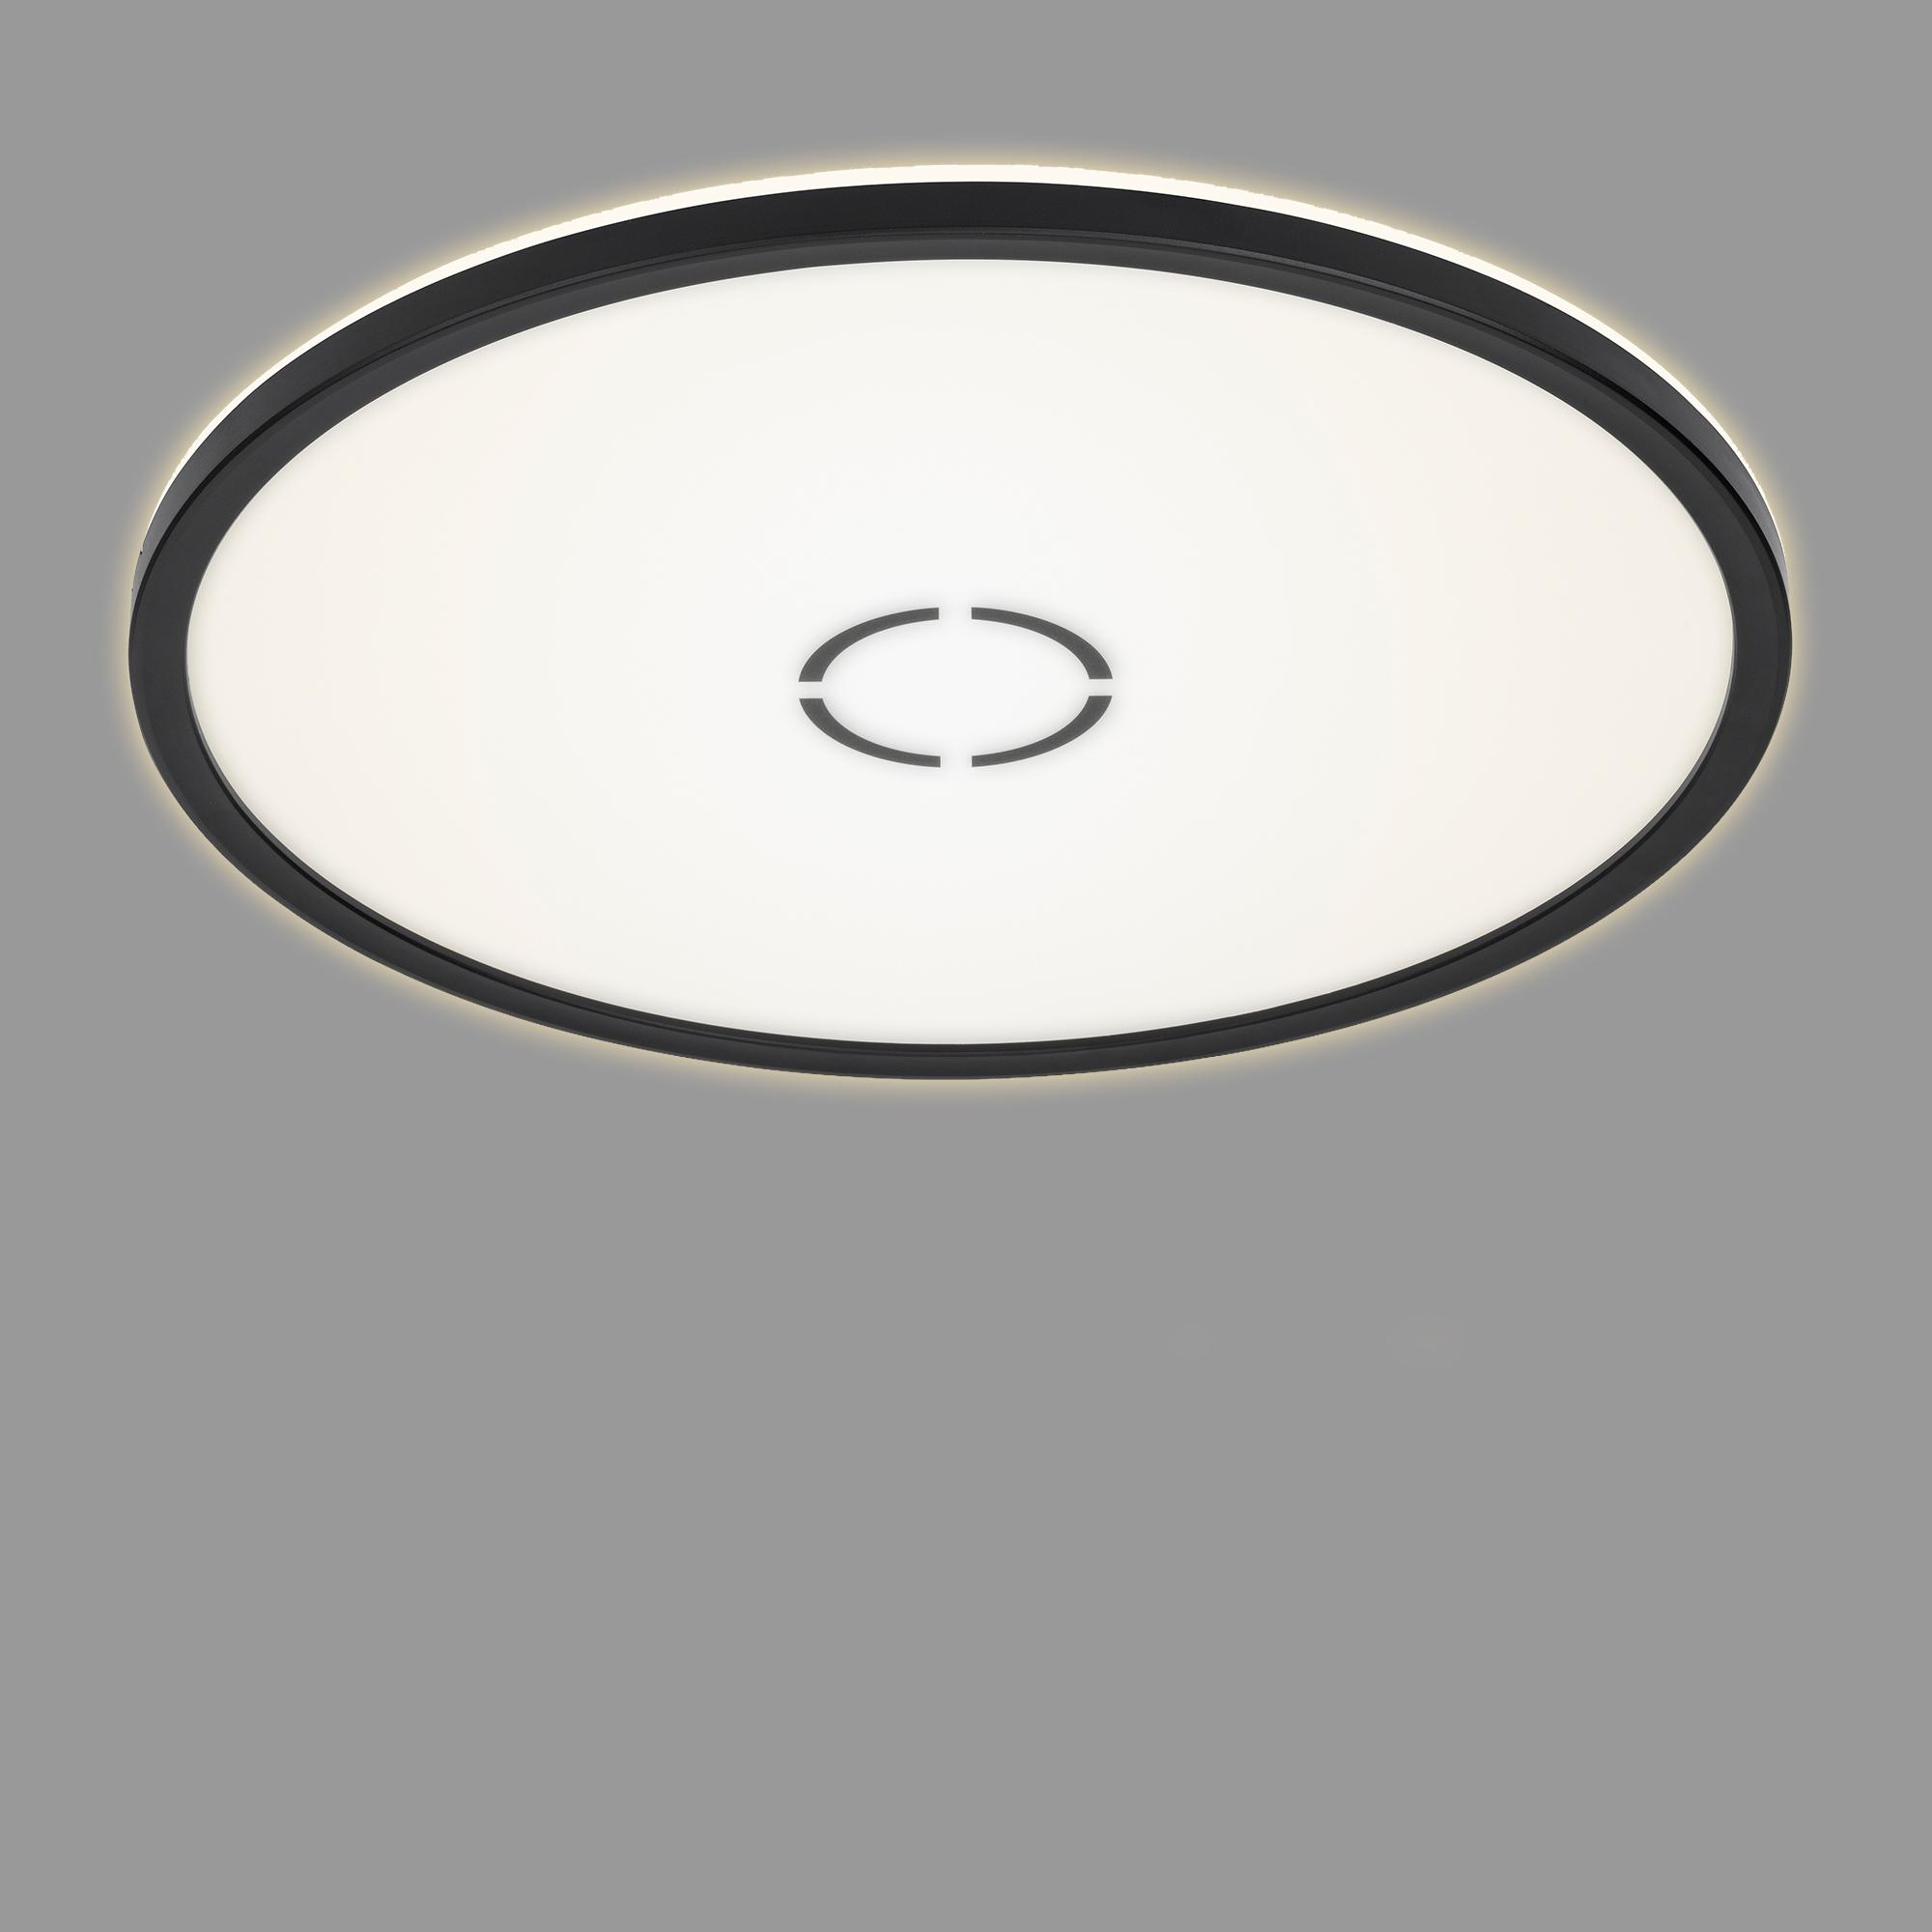 Slim LED Panel, Ø 42 cm, 3000 LUMEN, 22 WATT, Schwarz